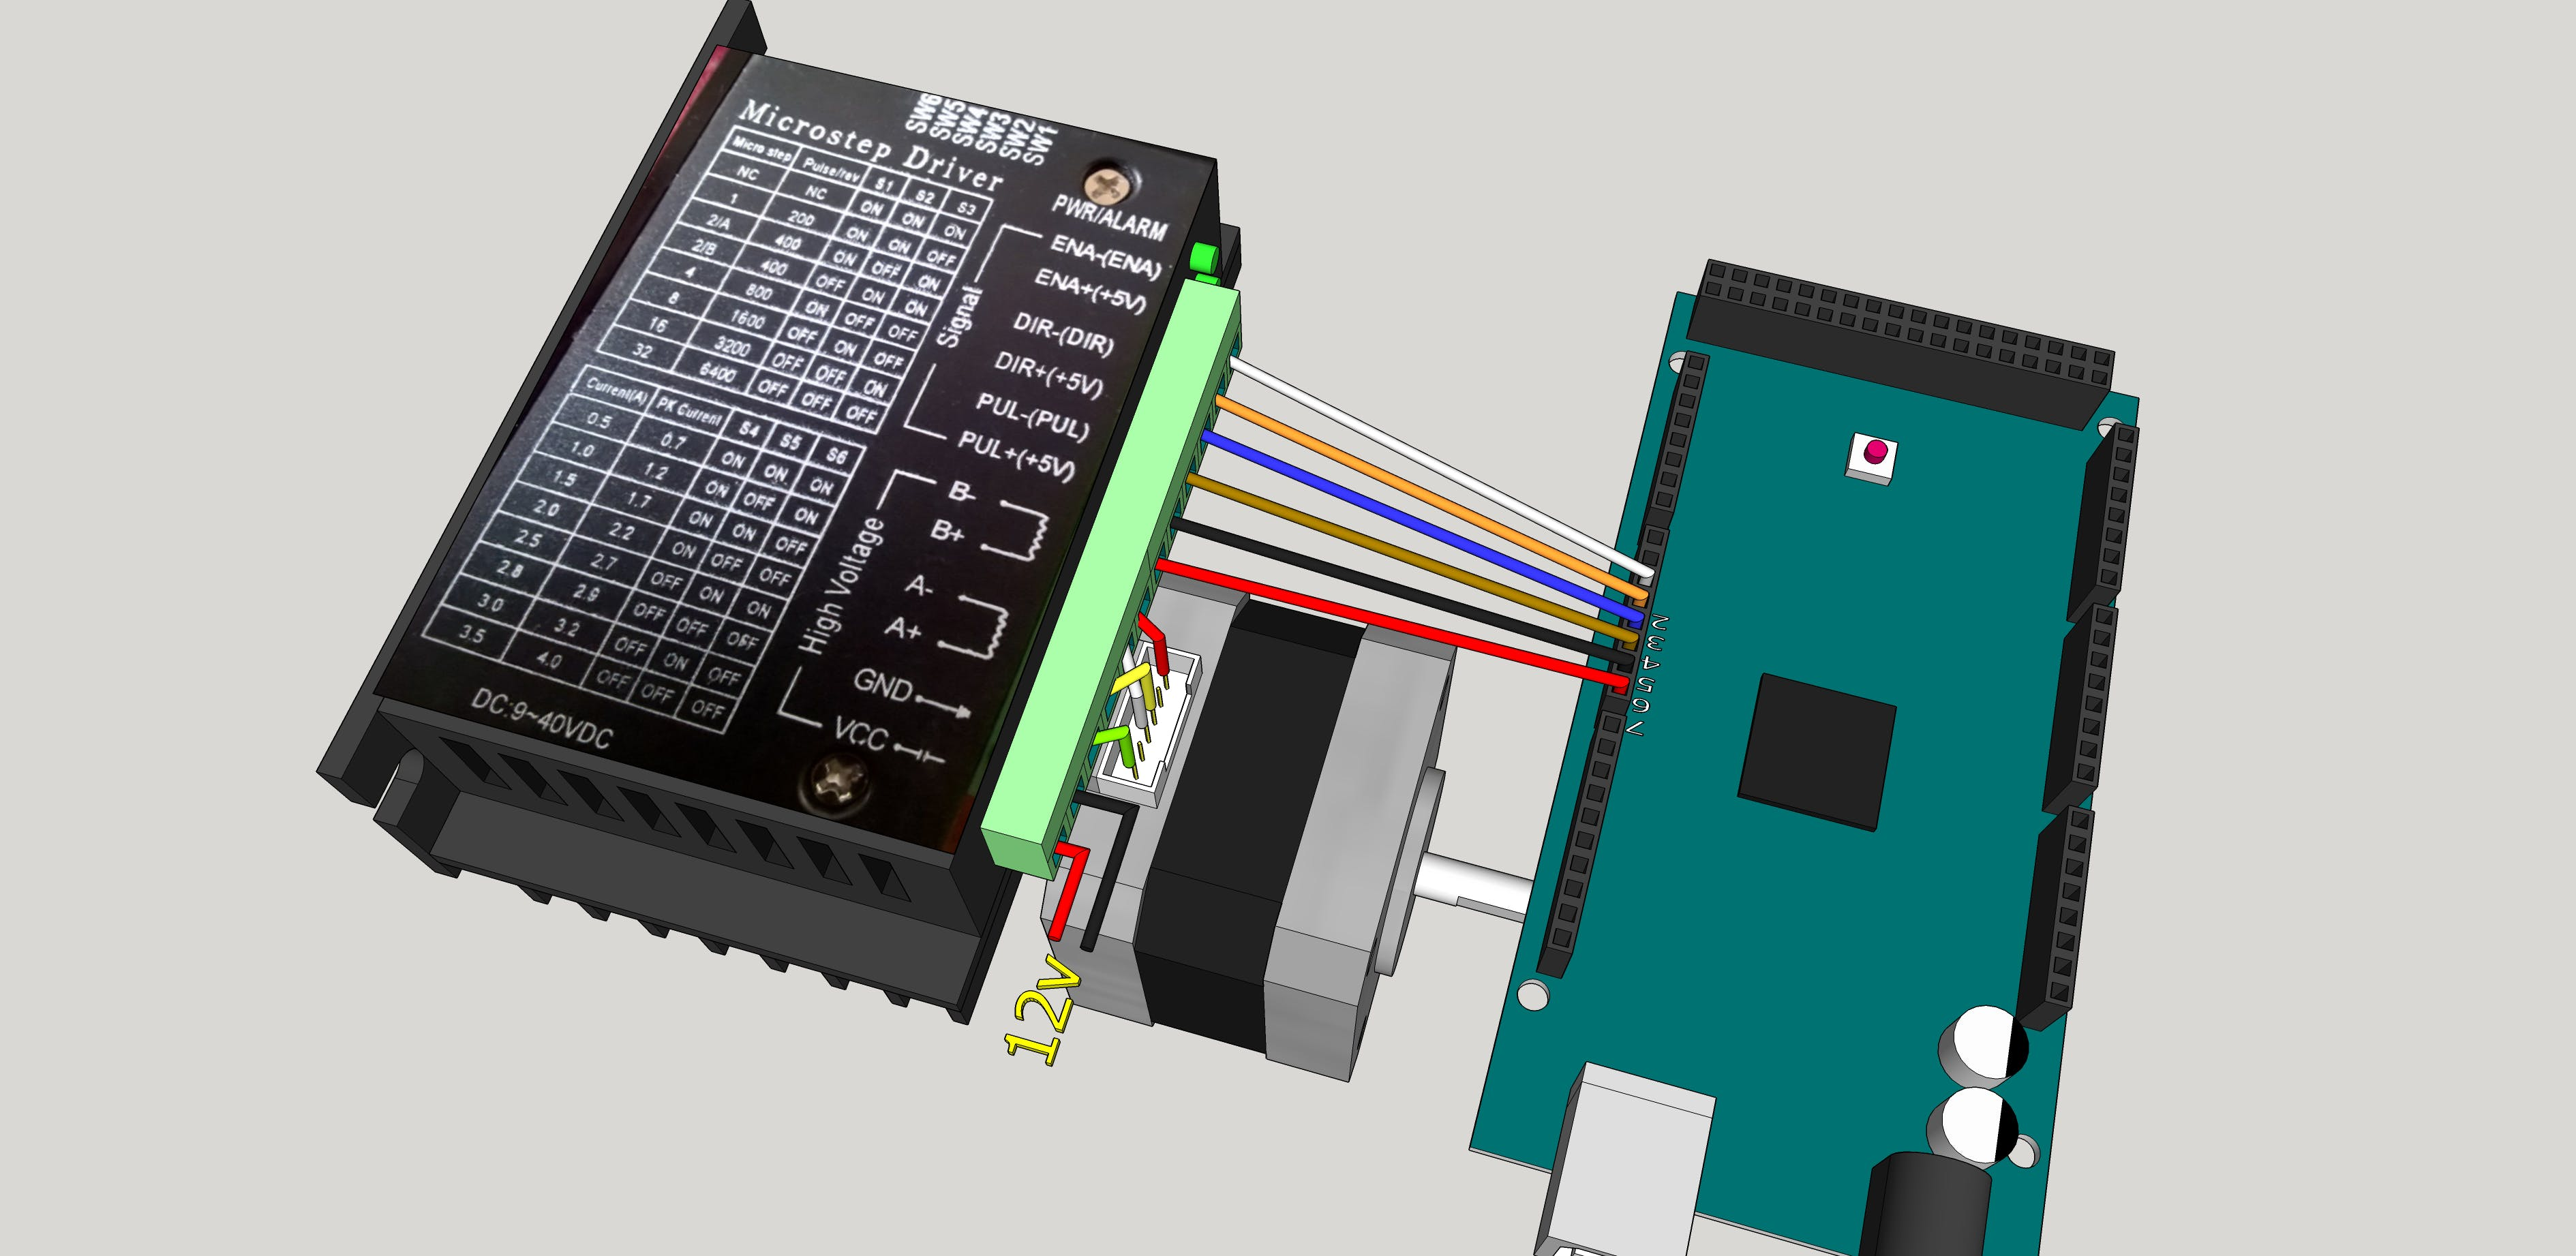 tb6600 stepper motor driver tester